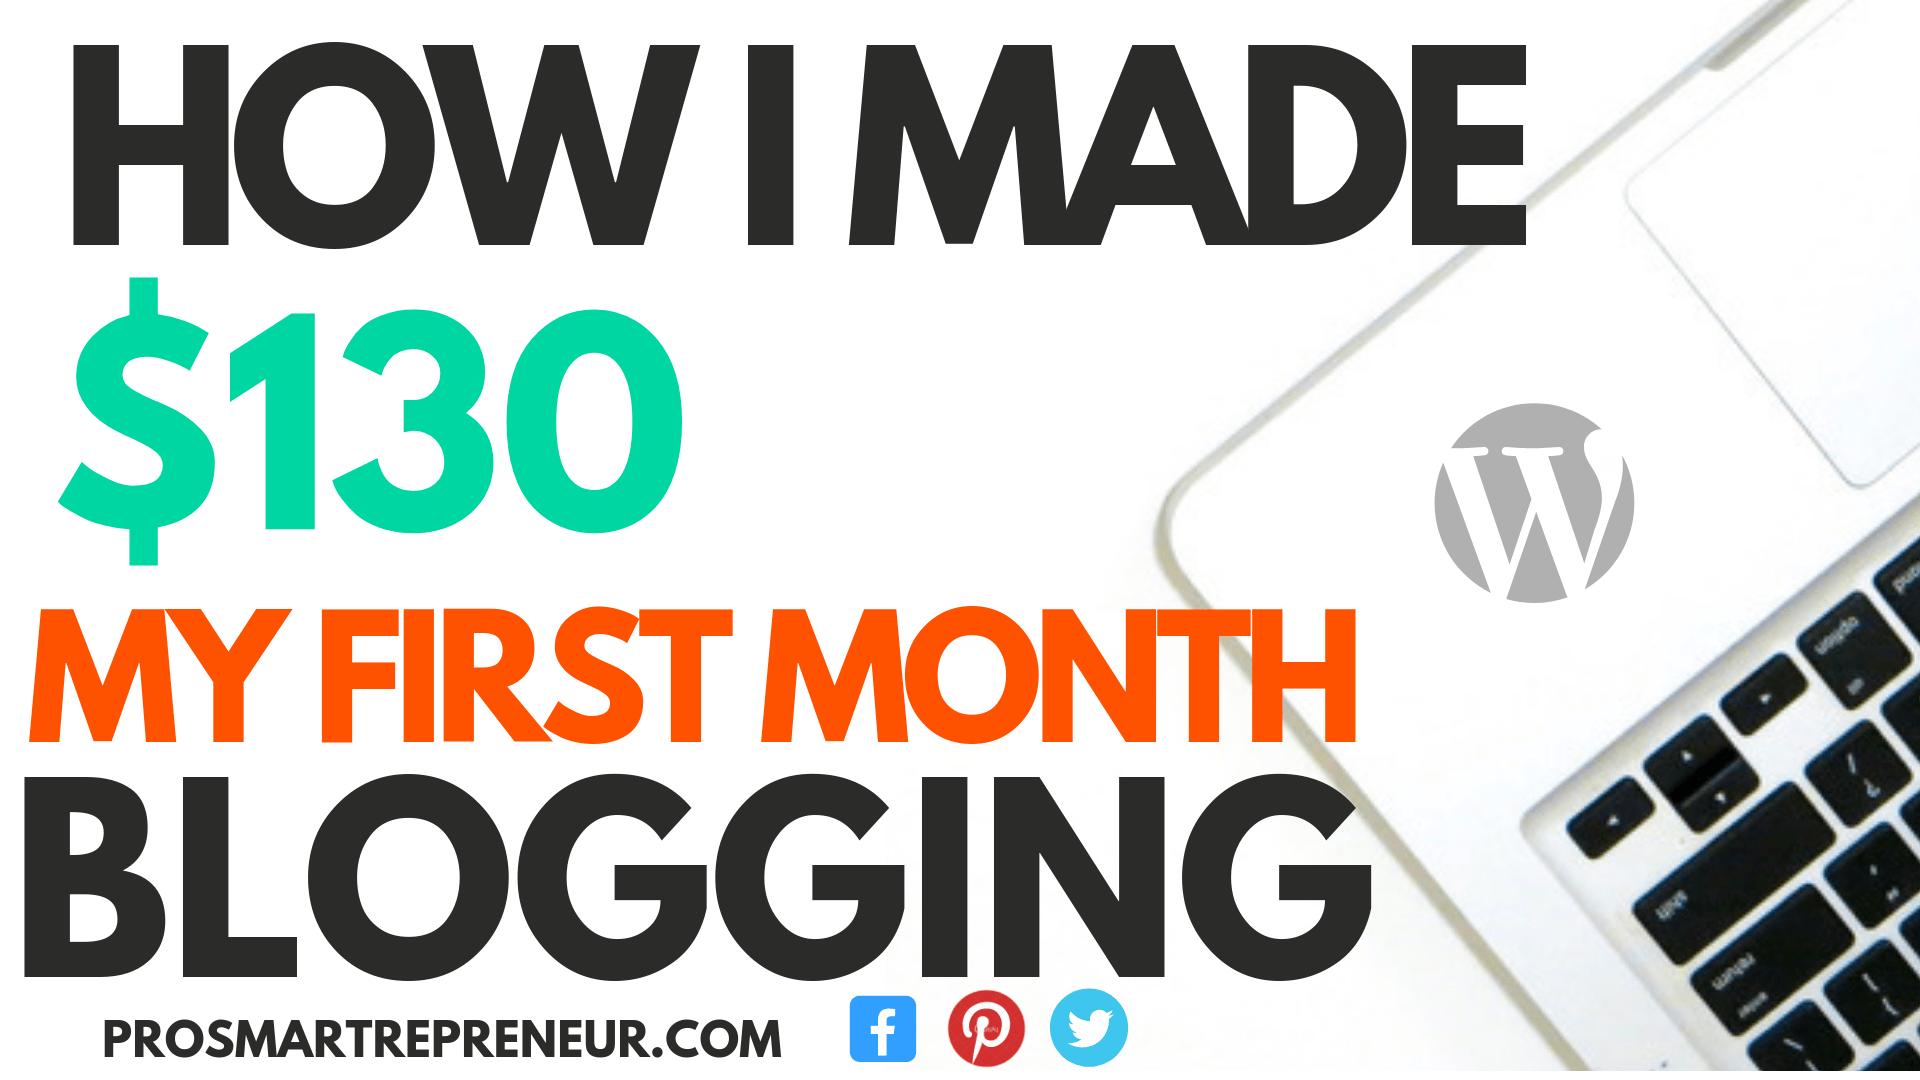 WordPress Blog Made $130 The First Month Blogging